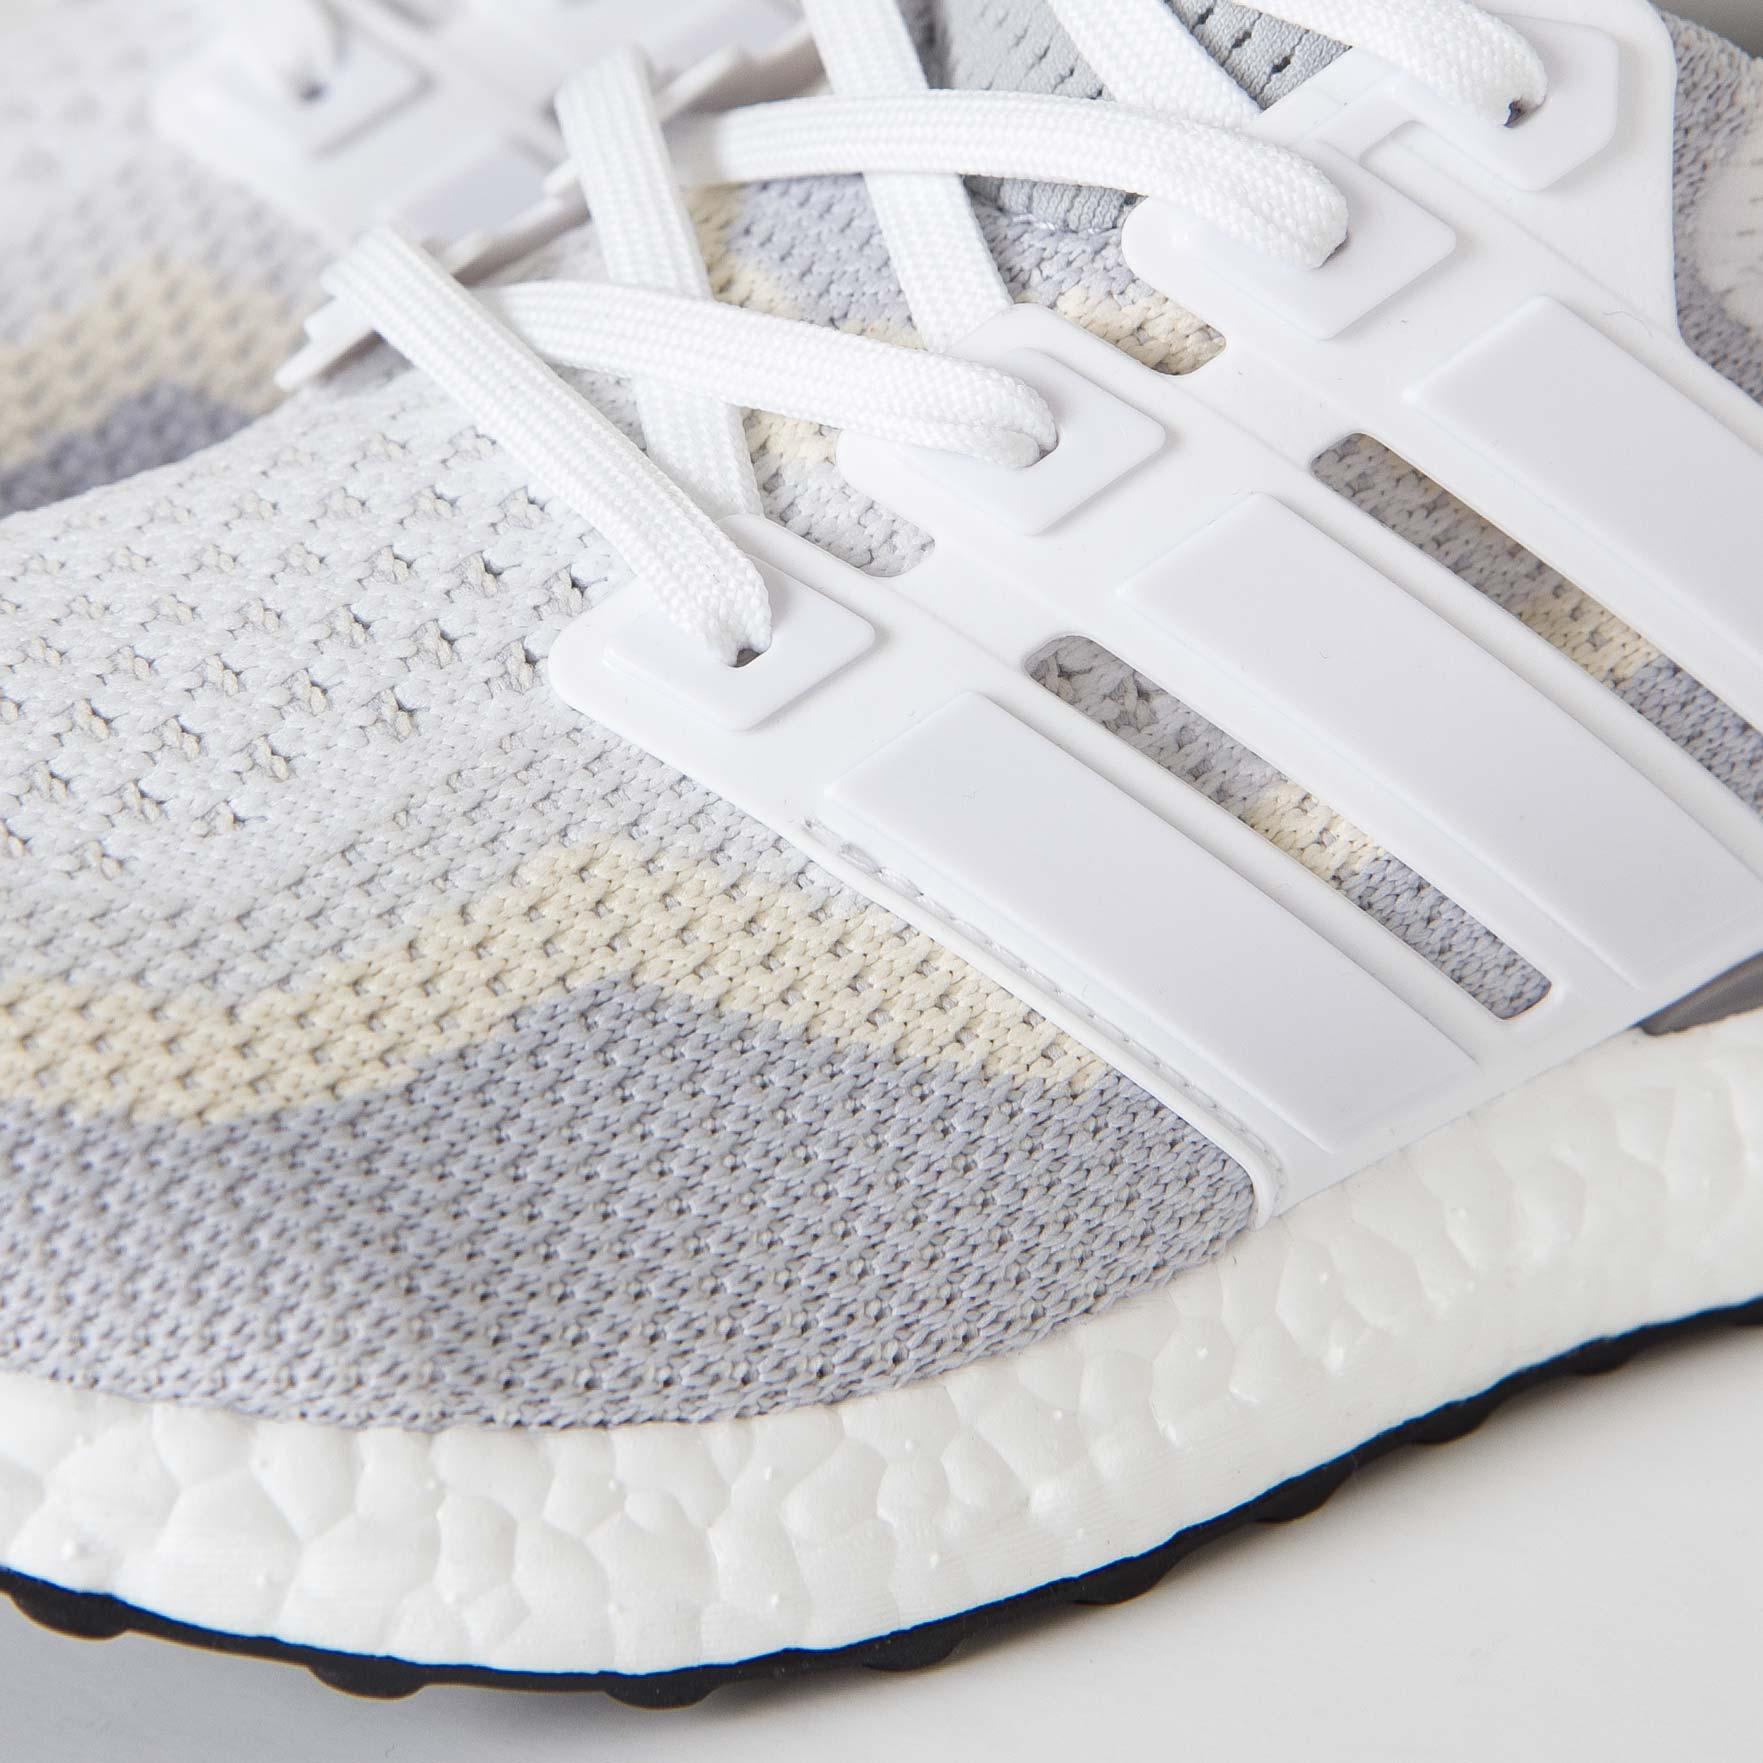 Adidas ultra impulso aq4007 scarpe da ginnasticanstuff scarpe & streetwear